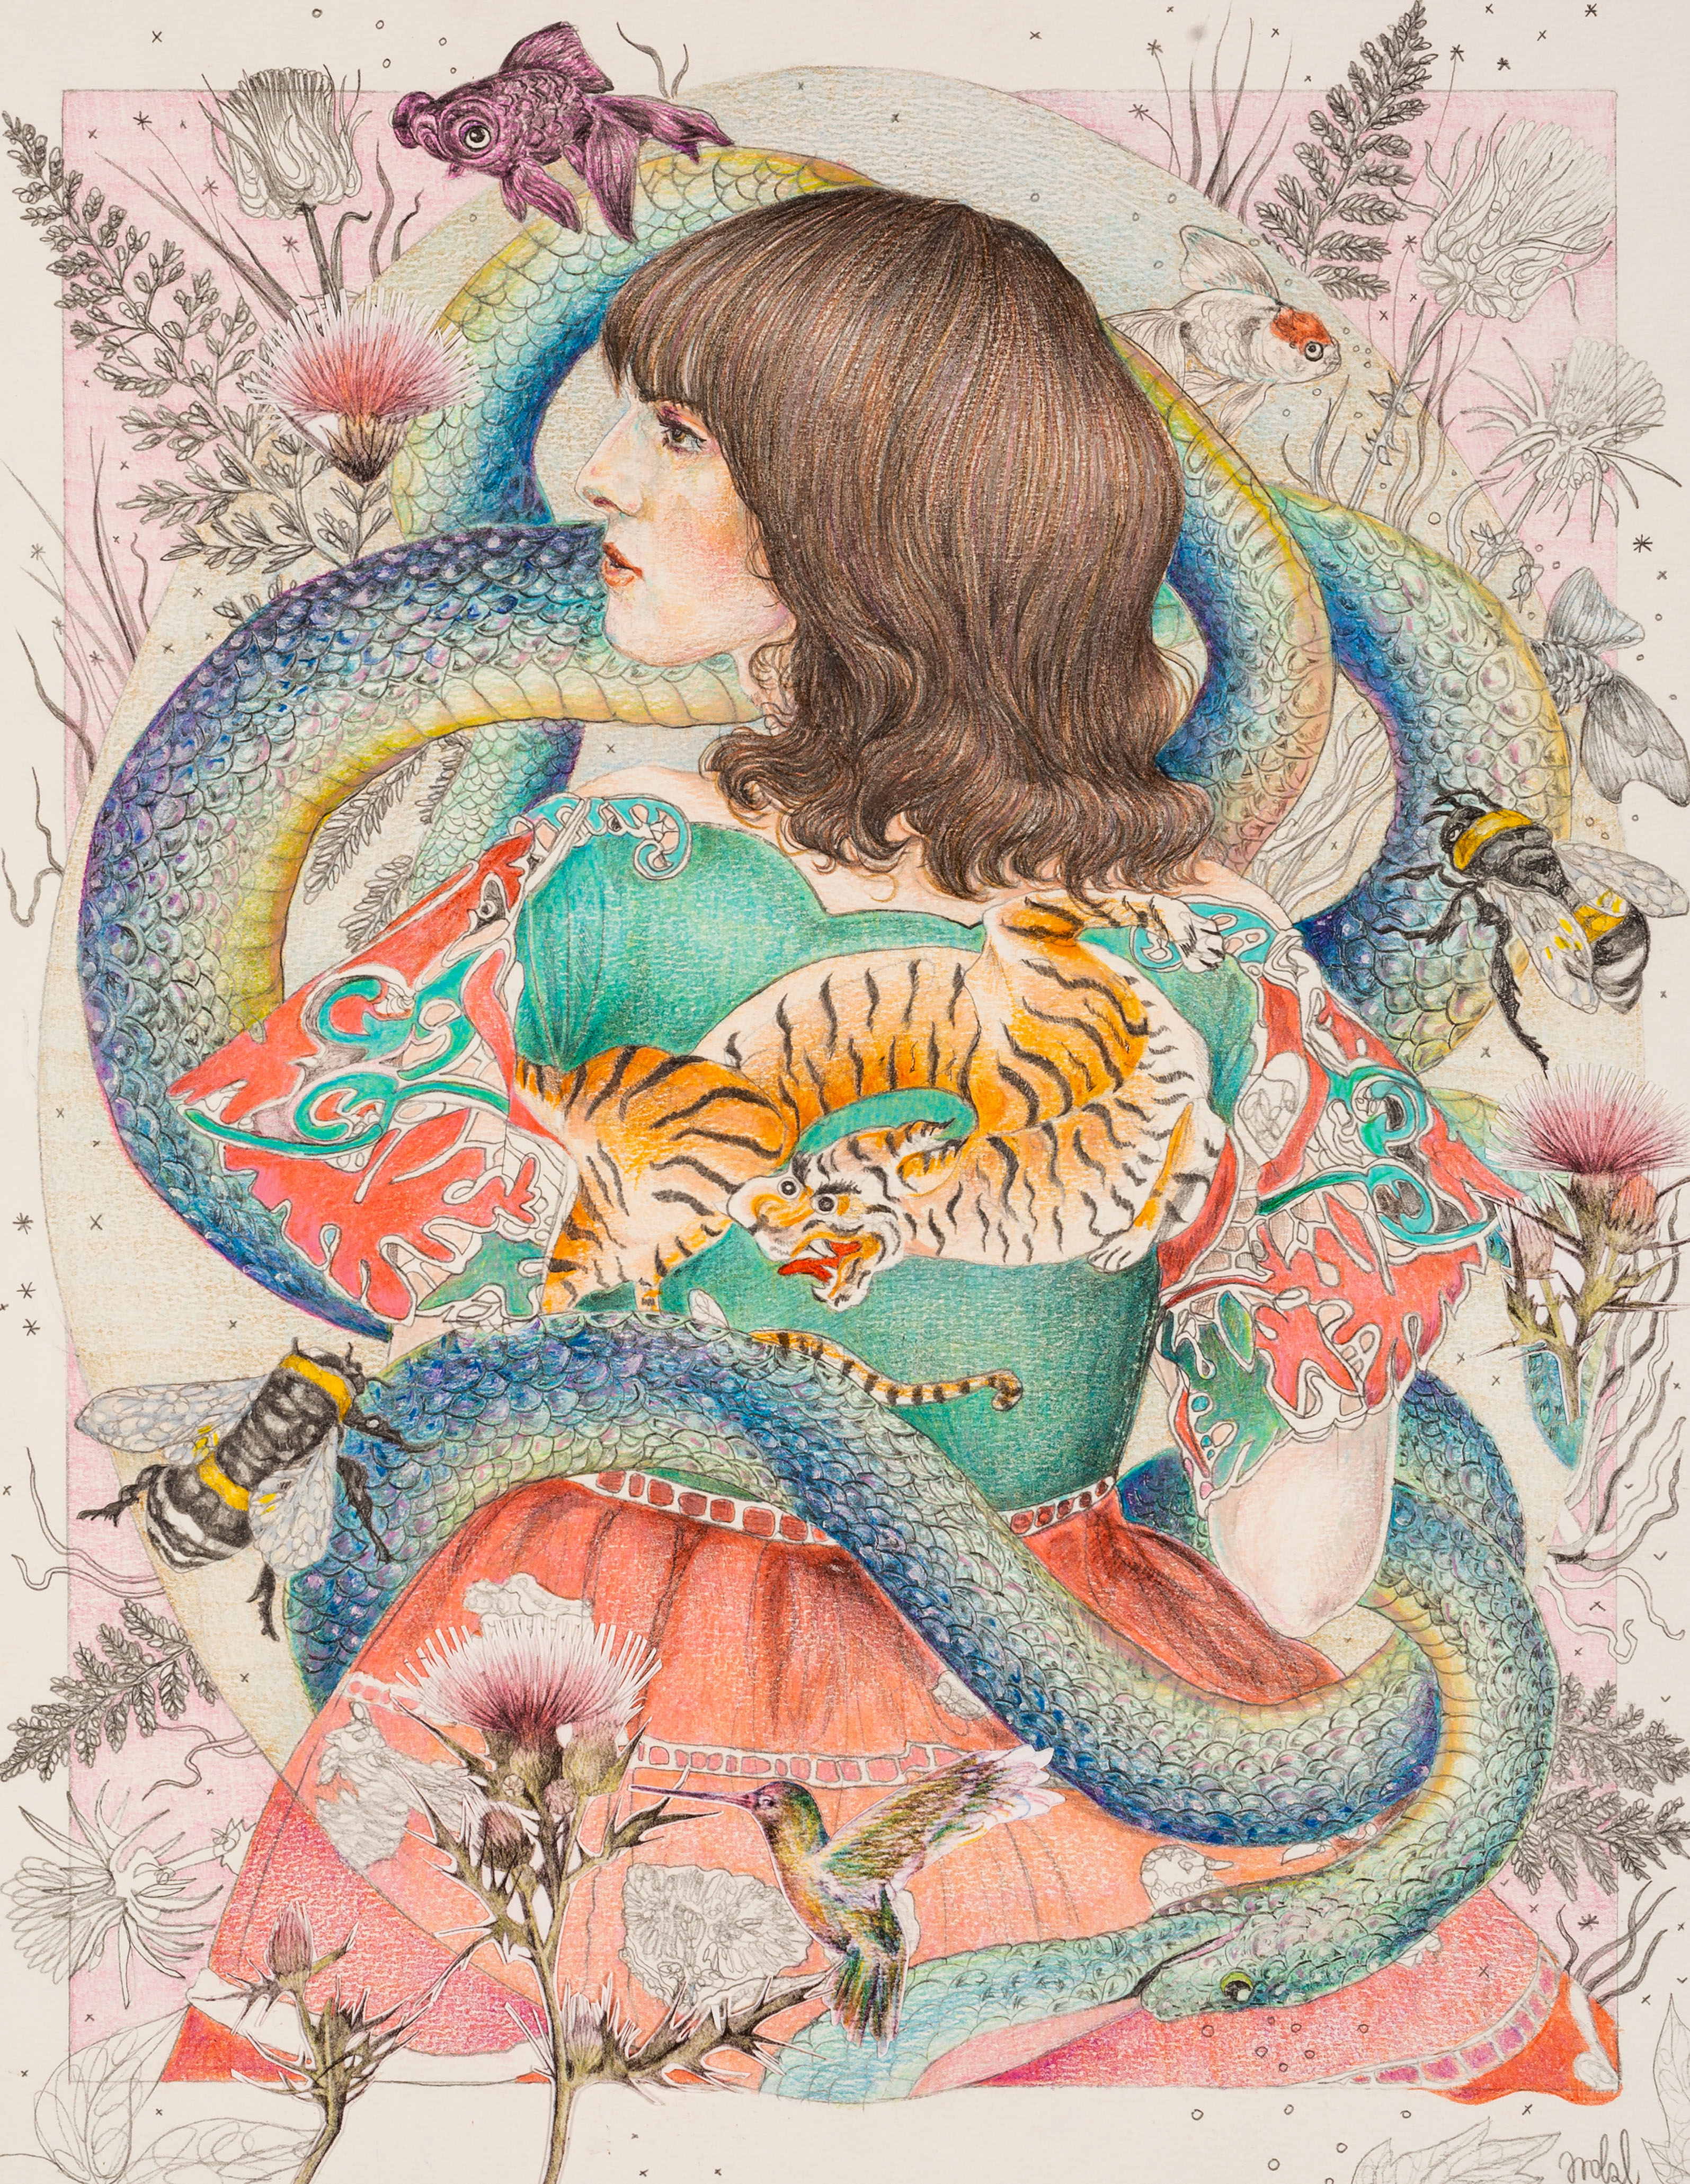 Ilustracja Gucci dla magazynu Unbpublished, wiosna 2016